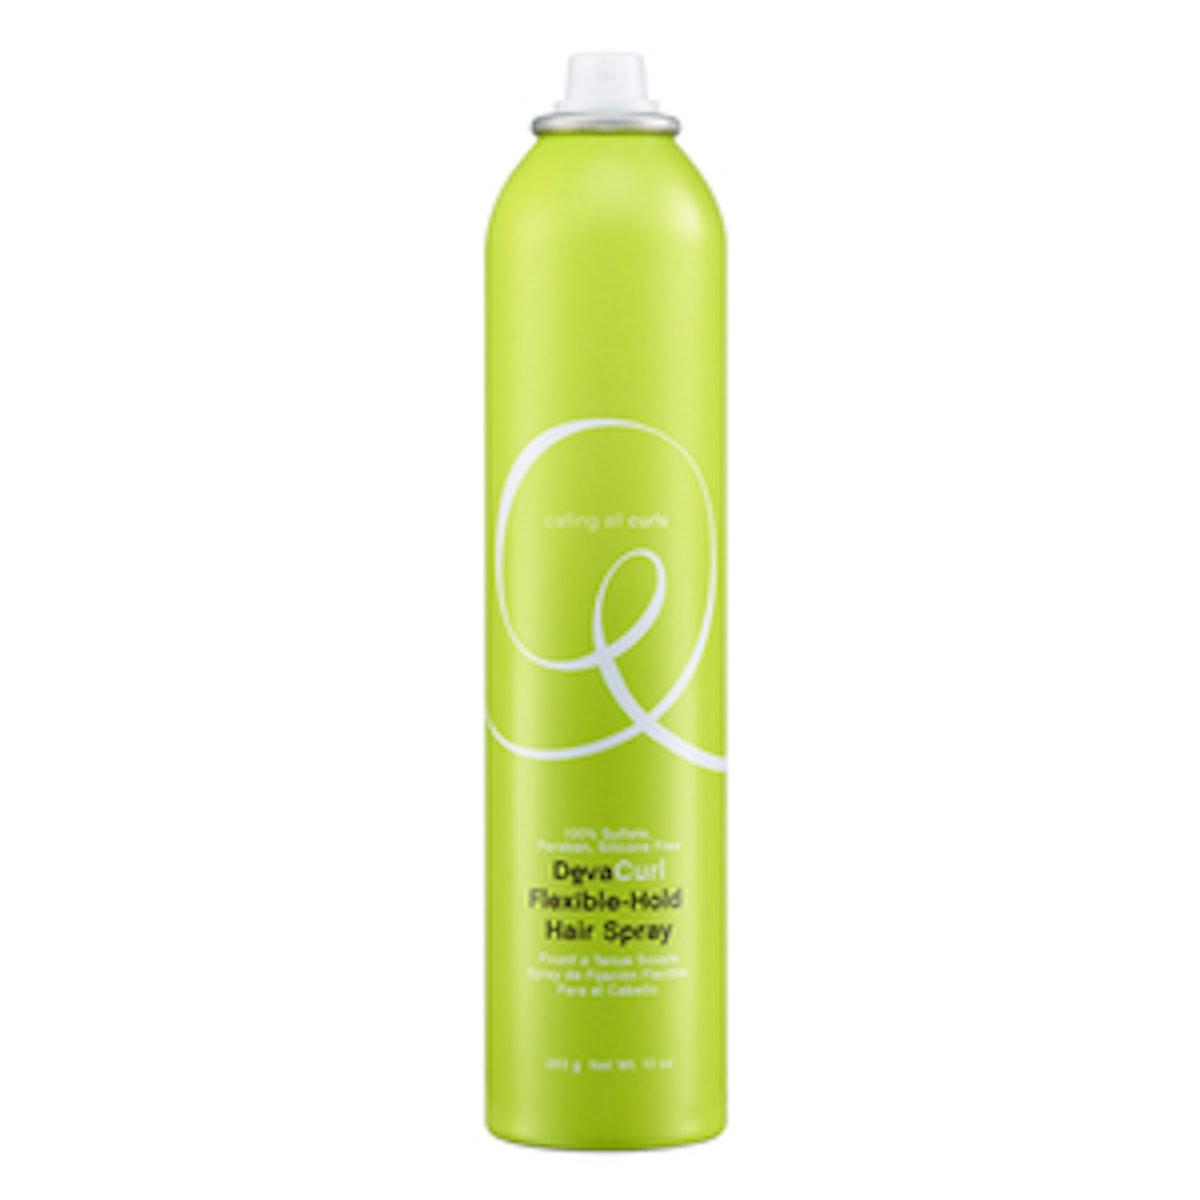 Flexible Hold Hairspray